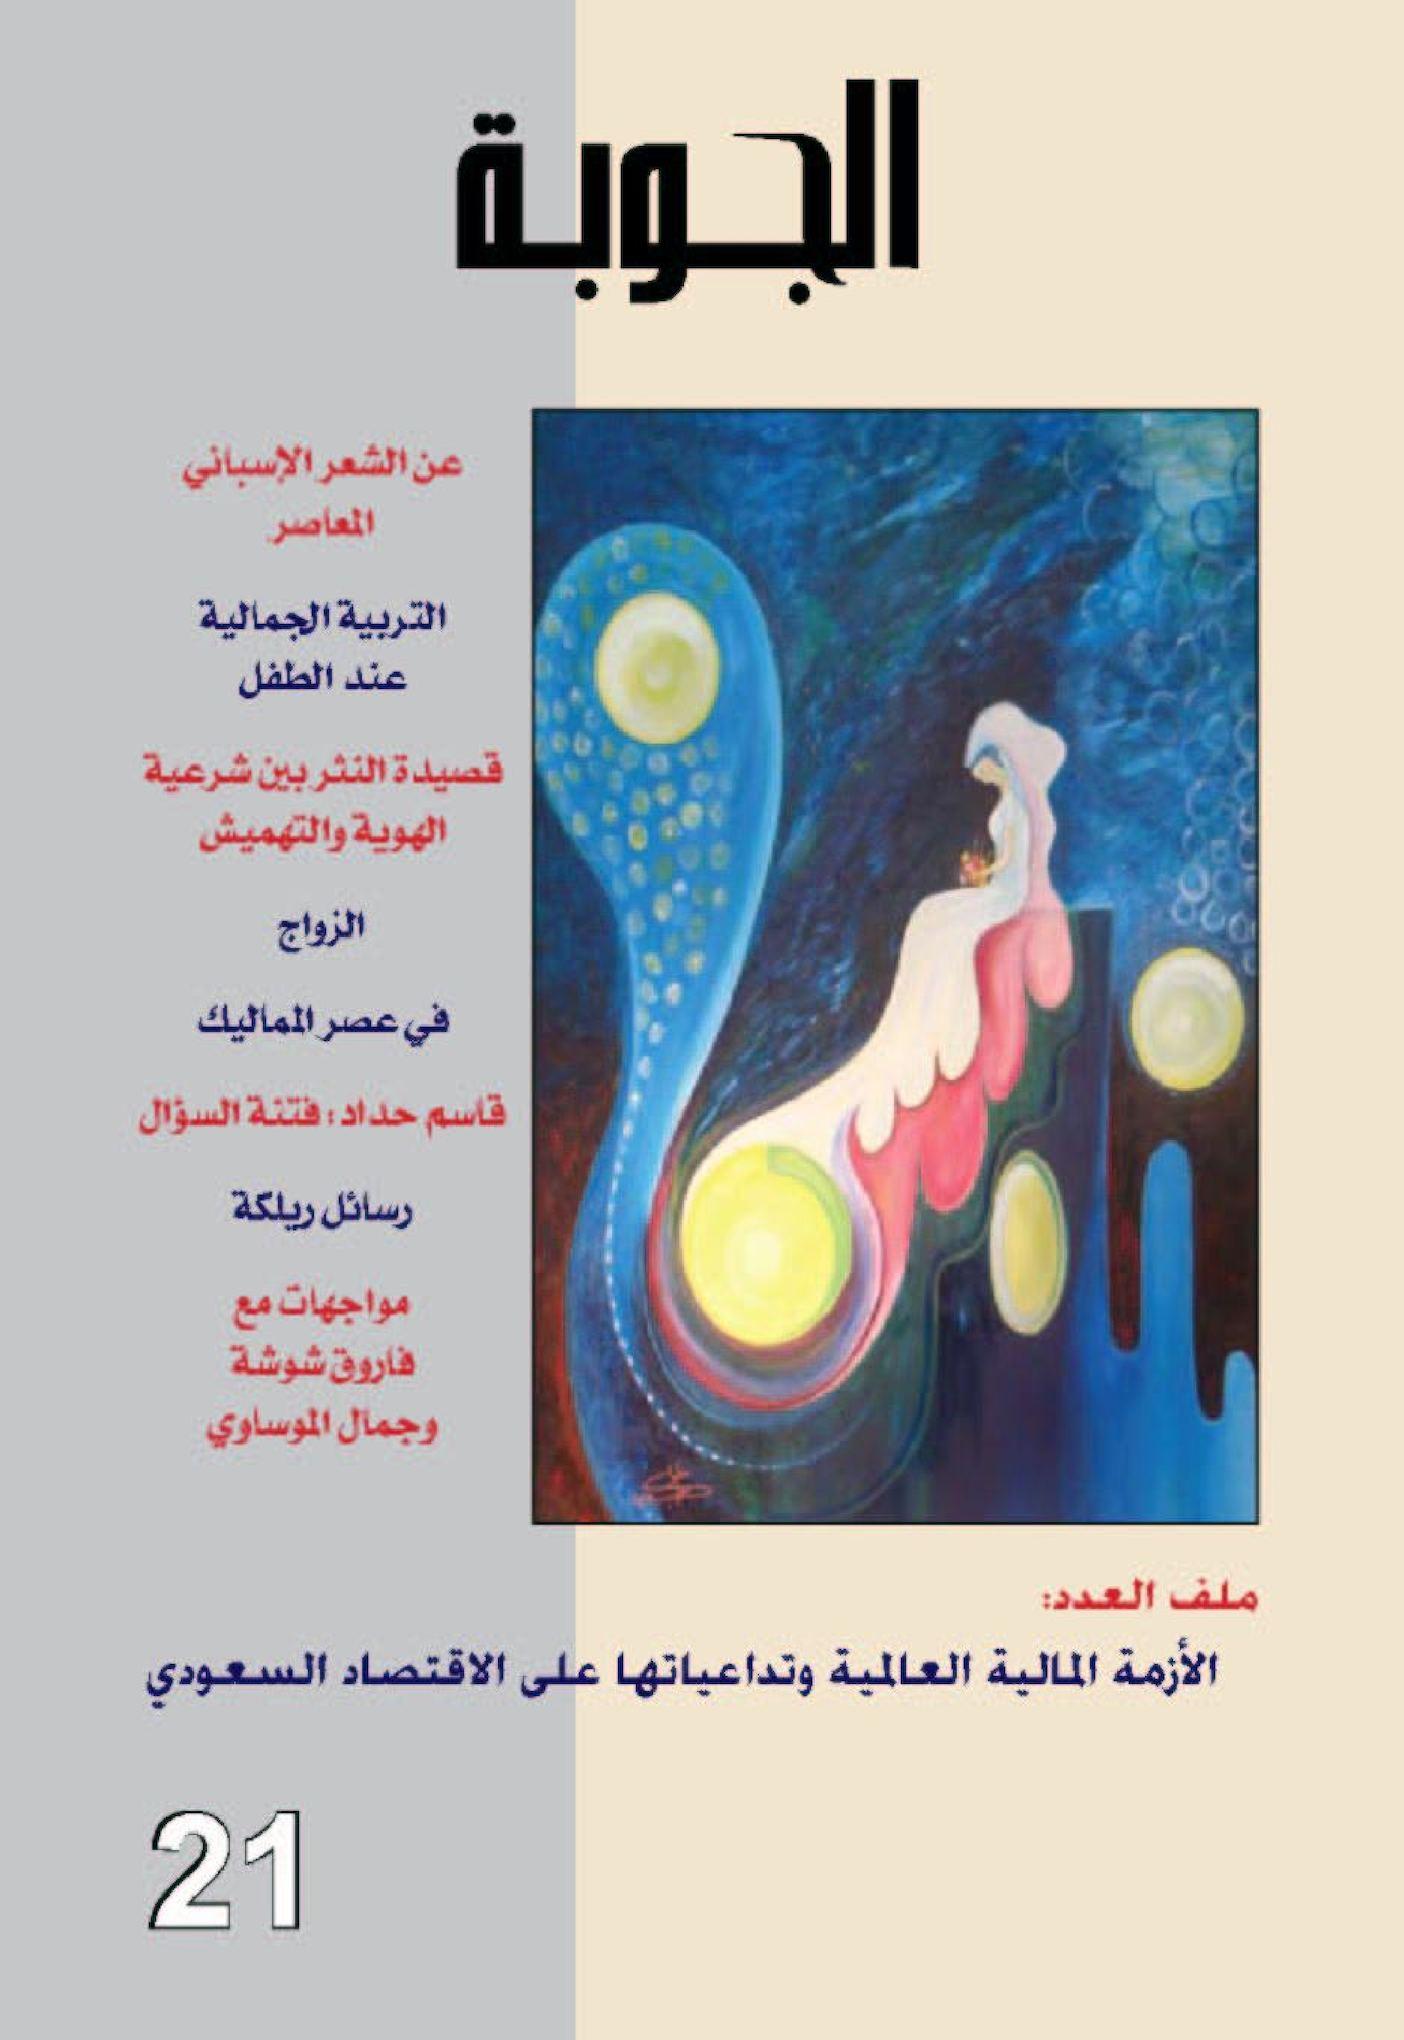 d68d0004f7d66 Calaméo - مجلة الجوبة 21 Aljoubah